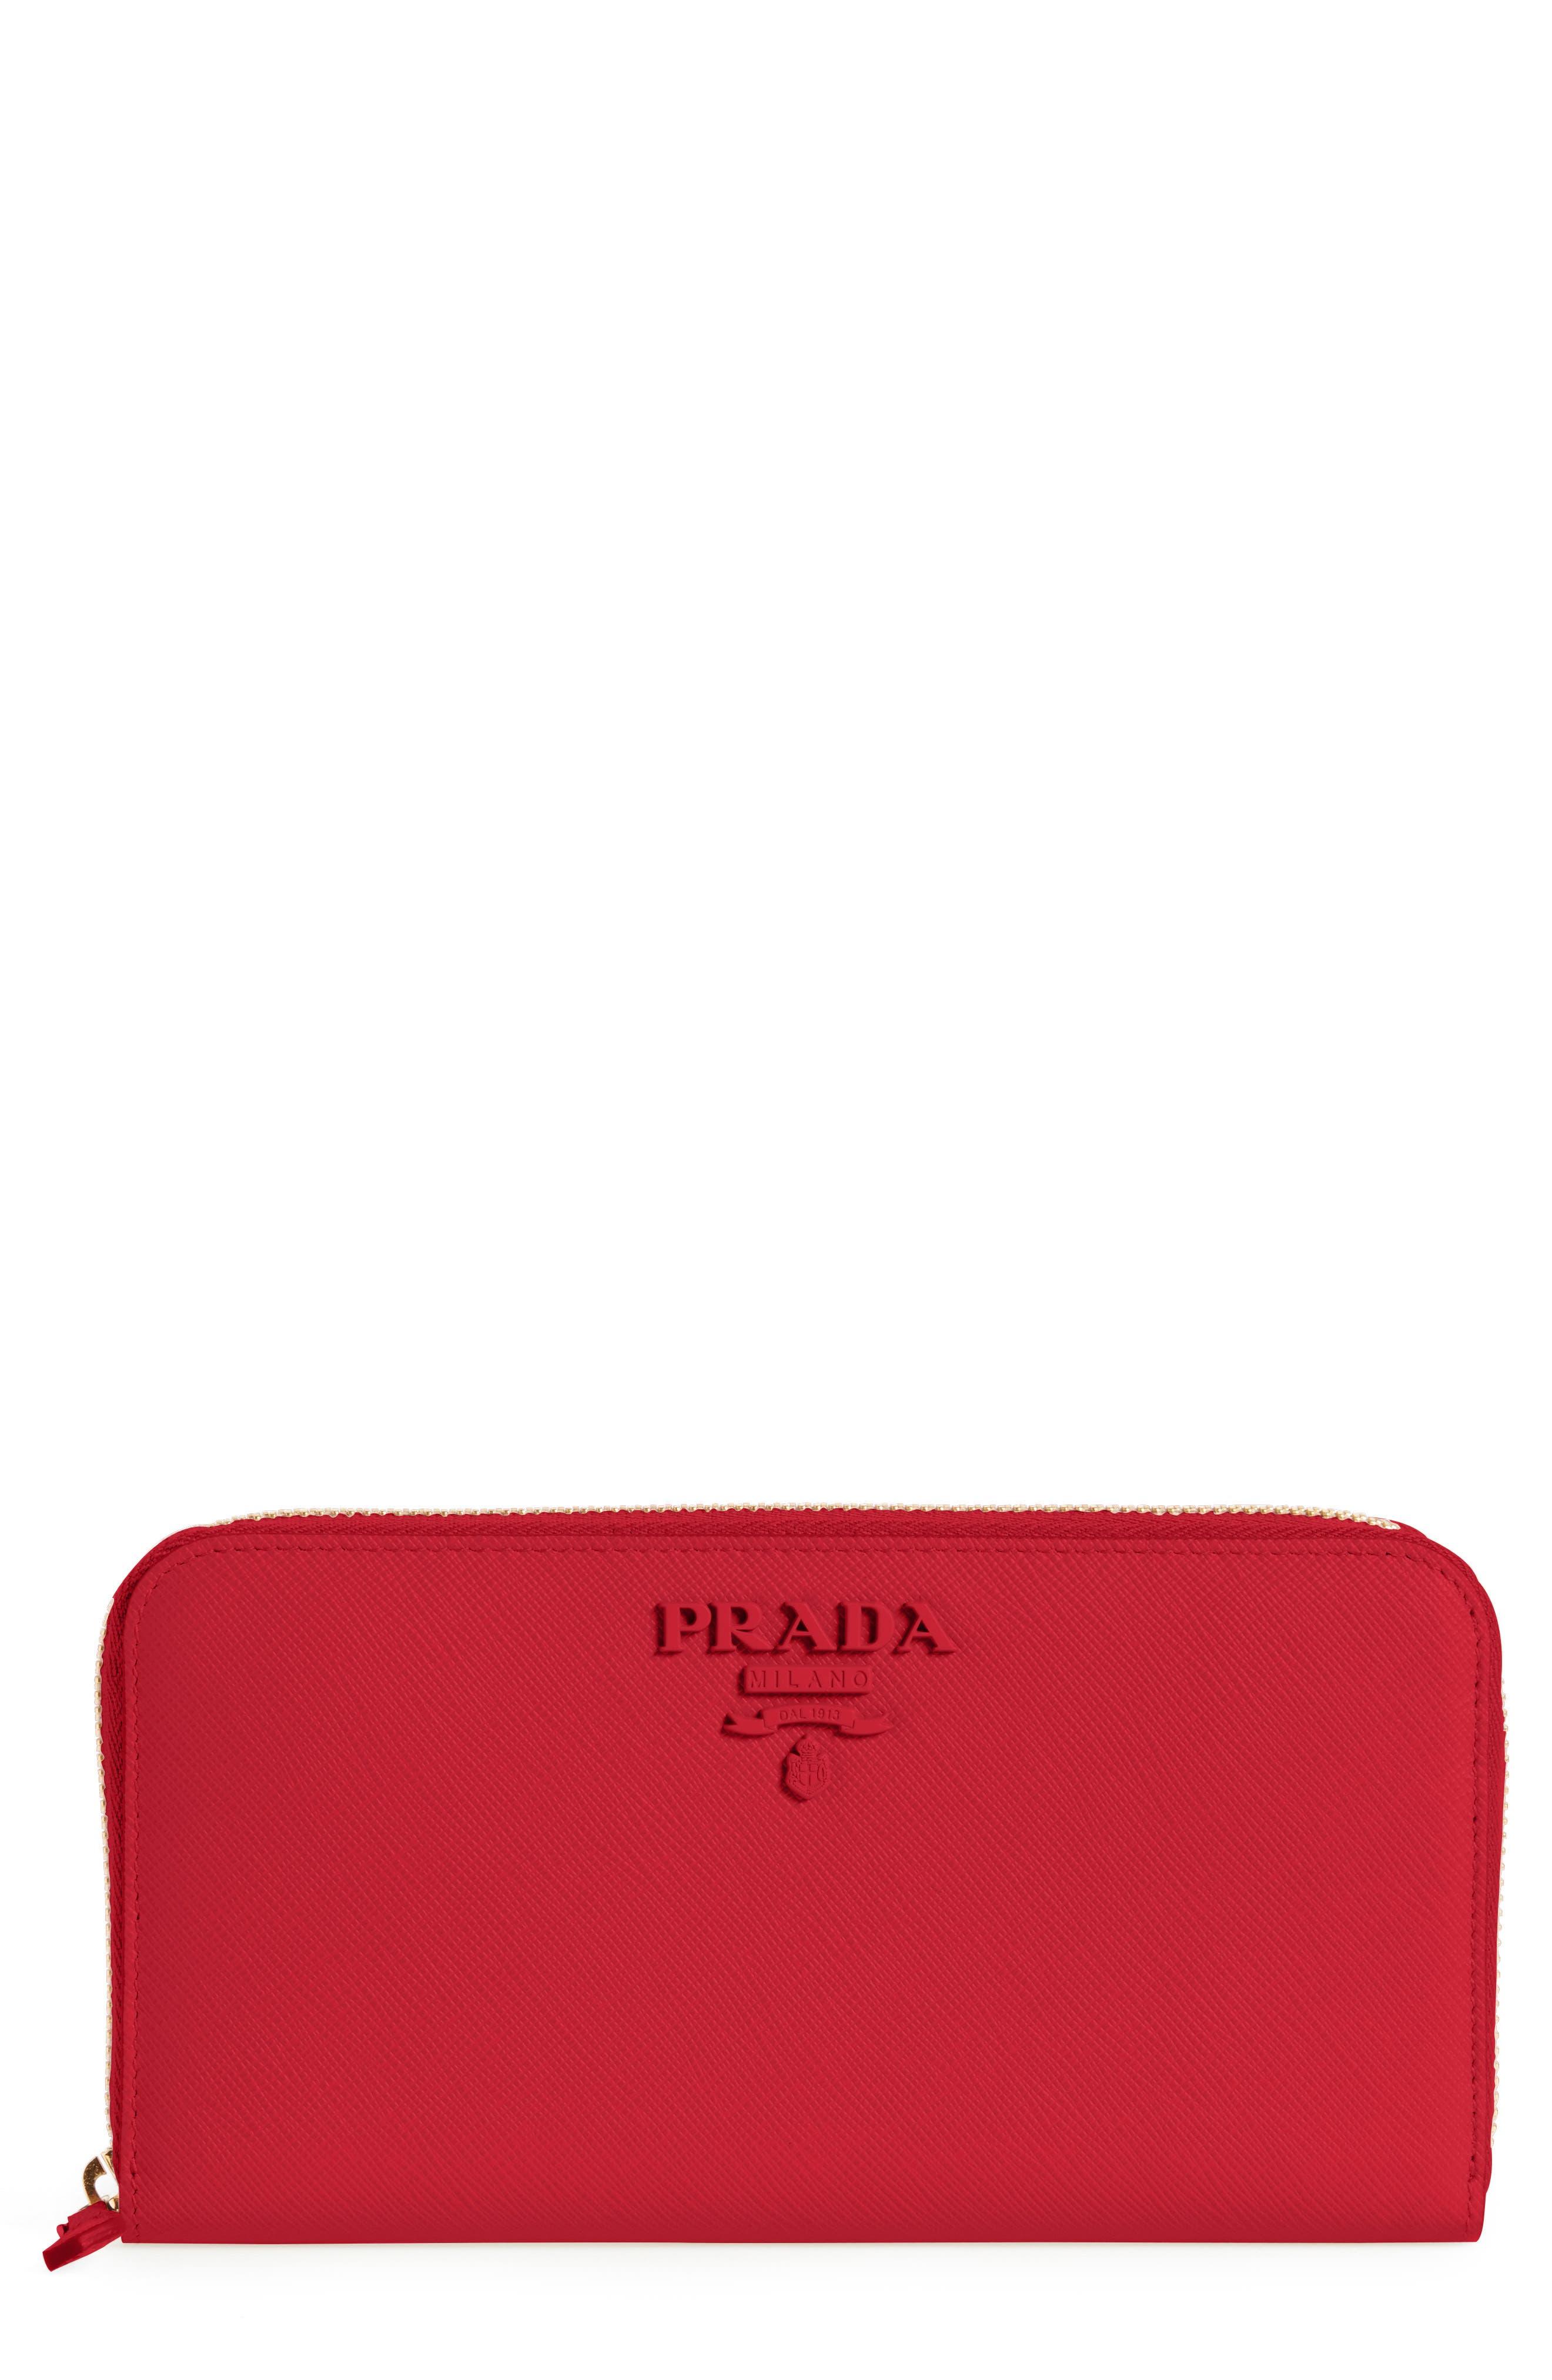 a9e8eb3f2d84 ... where can i buy prada saffiano leather zip around wallet 5469c 93c70